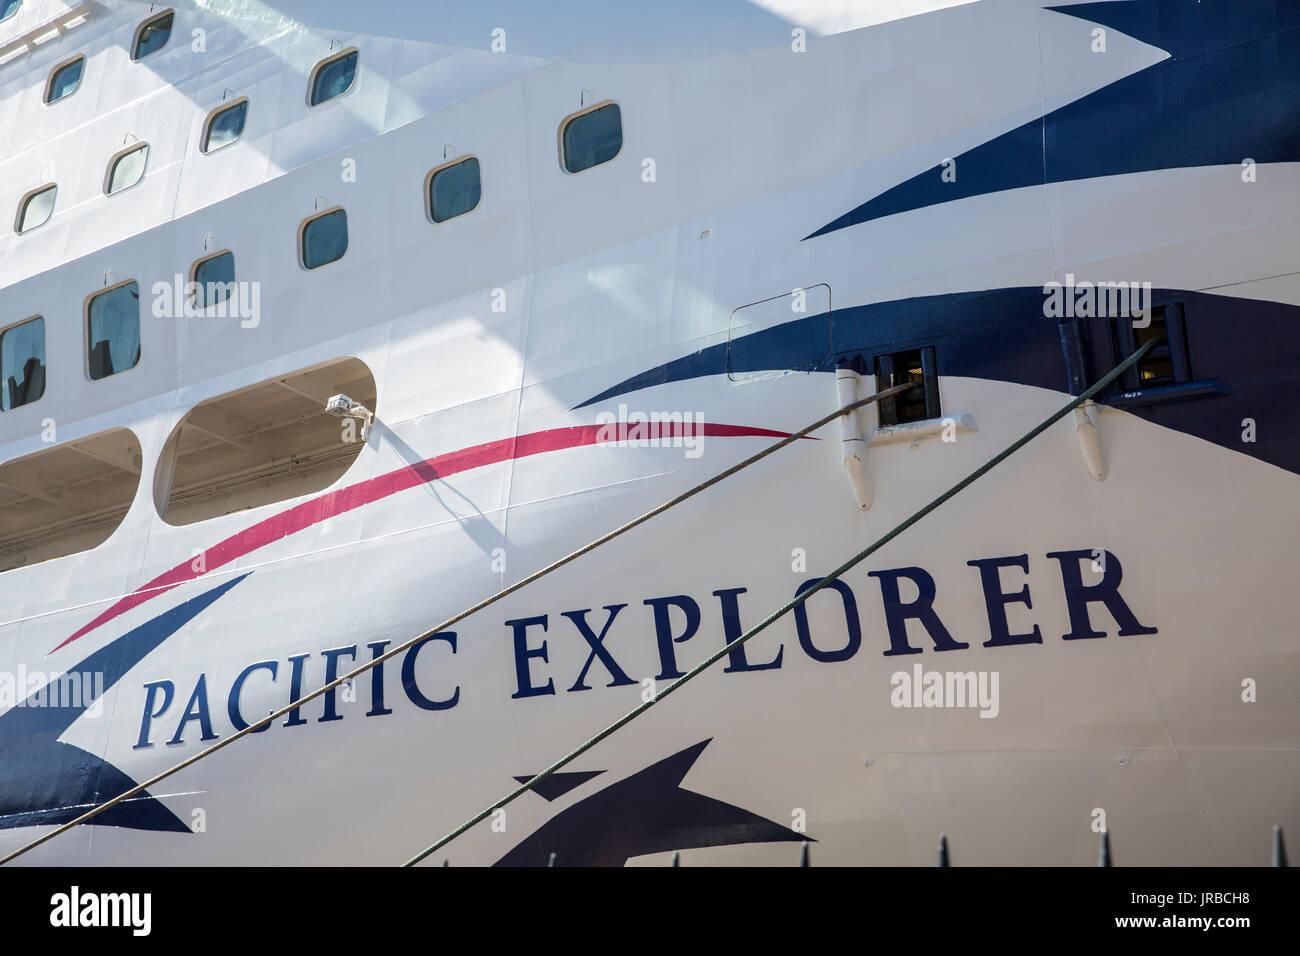 P Amp O Pacific Explorer Cruise Ship Liner At Overseas Passenger Terminal Stock Photo 152071396 Alamy